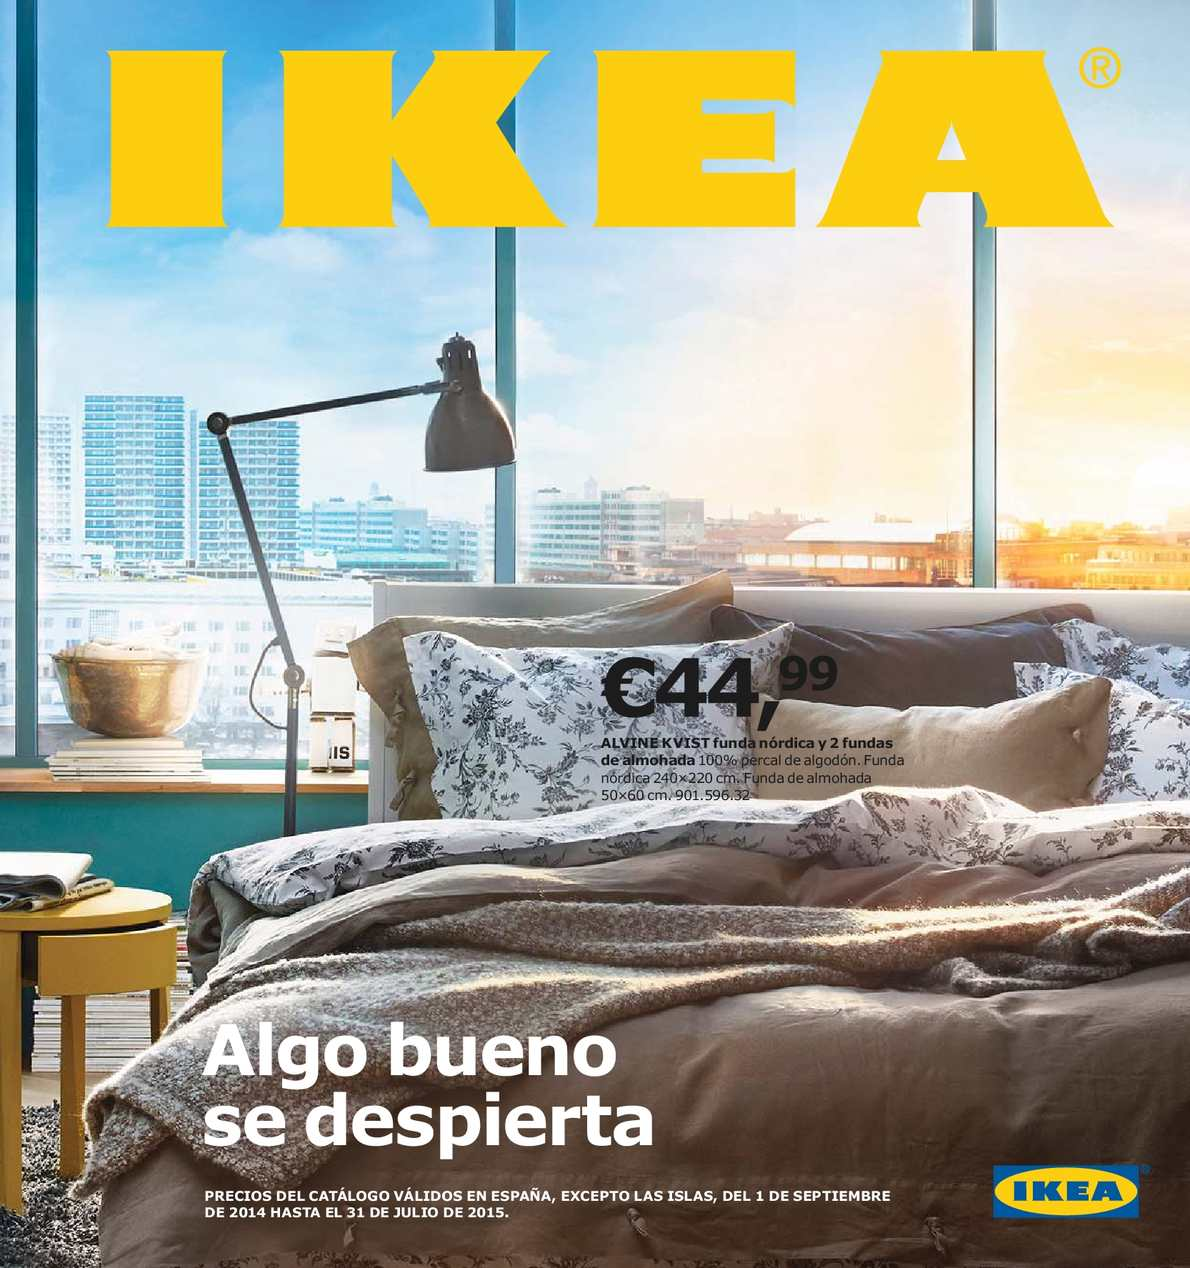 Calaméo - Ikea: Algo bueno se despierta